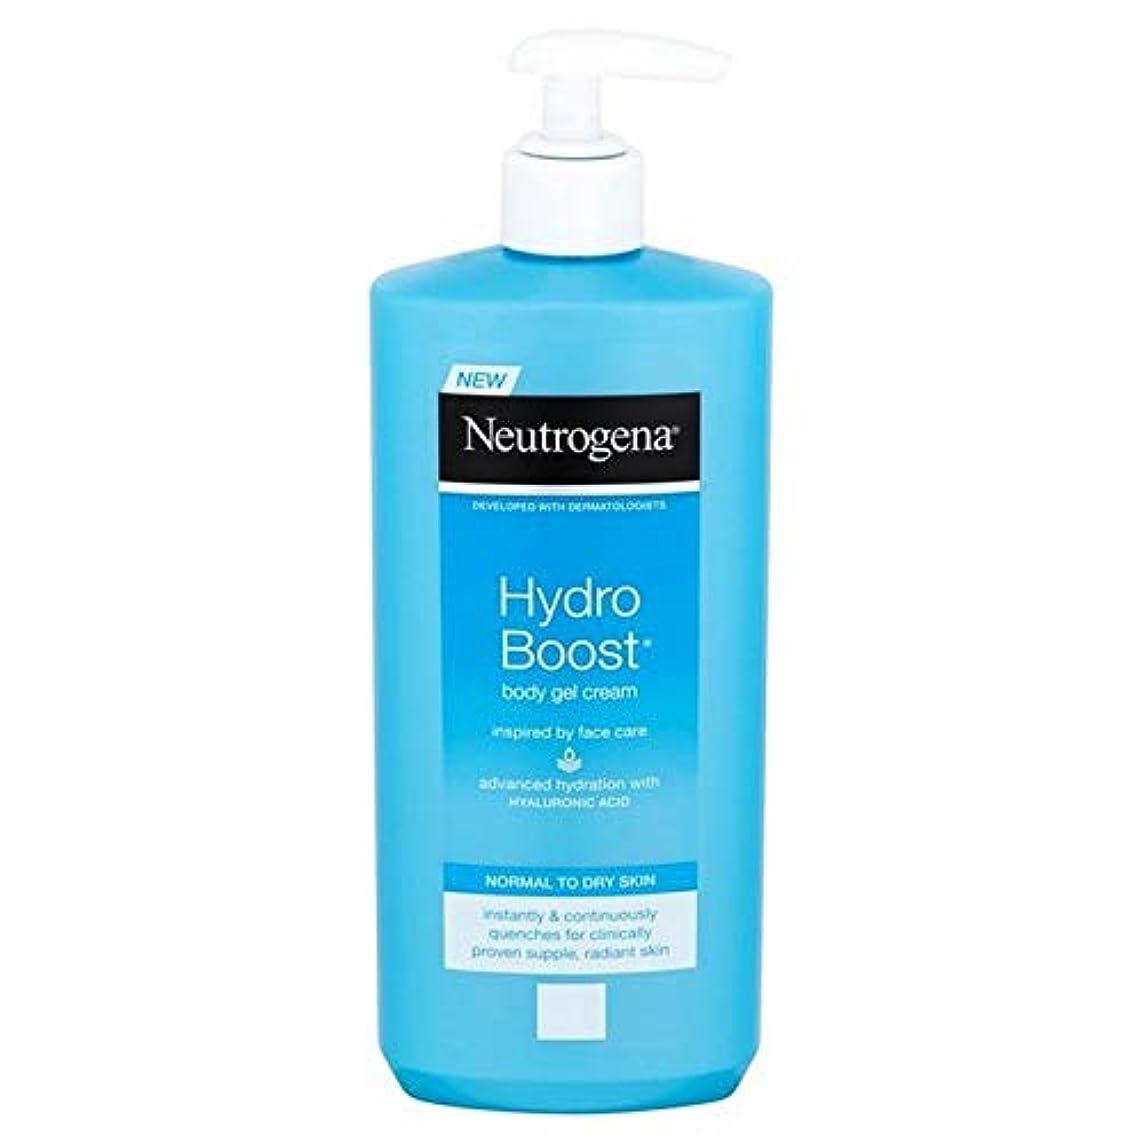 [Neutrogena ] ニュートロジーナ水力発電は、ボディジェルクリーム400ミリリットルを後押し - Neutrogena Hydro Boost Body Gel Cream 400ml [並行輸入品]